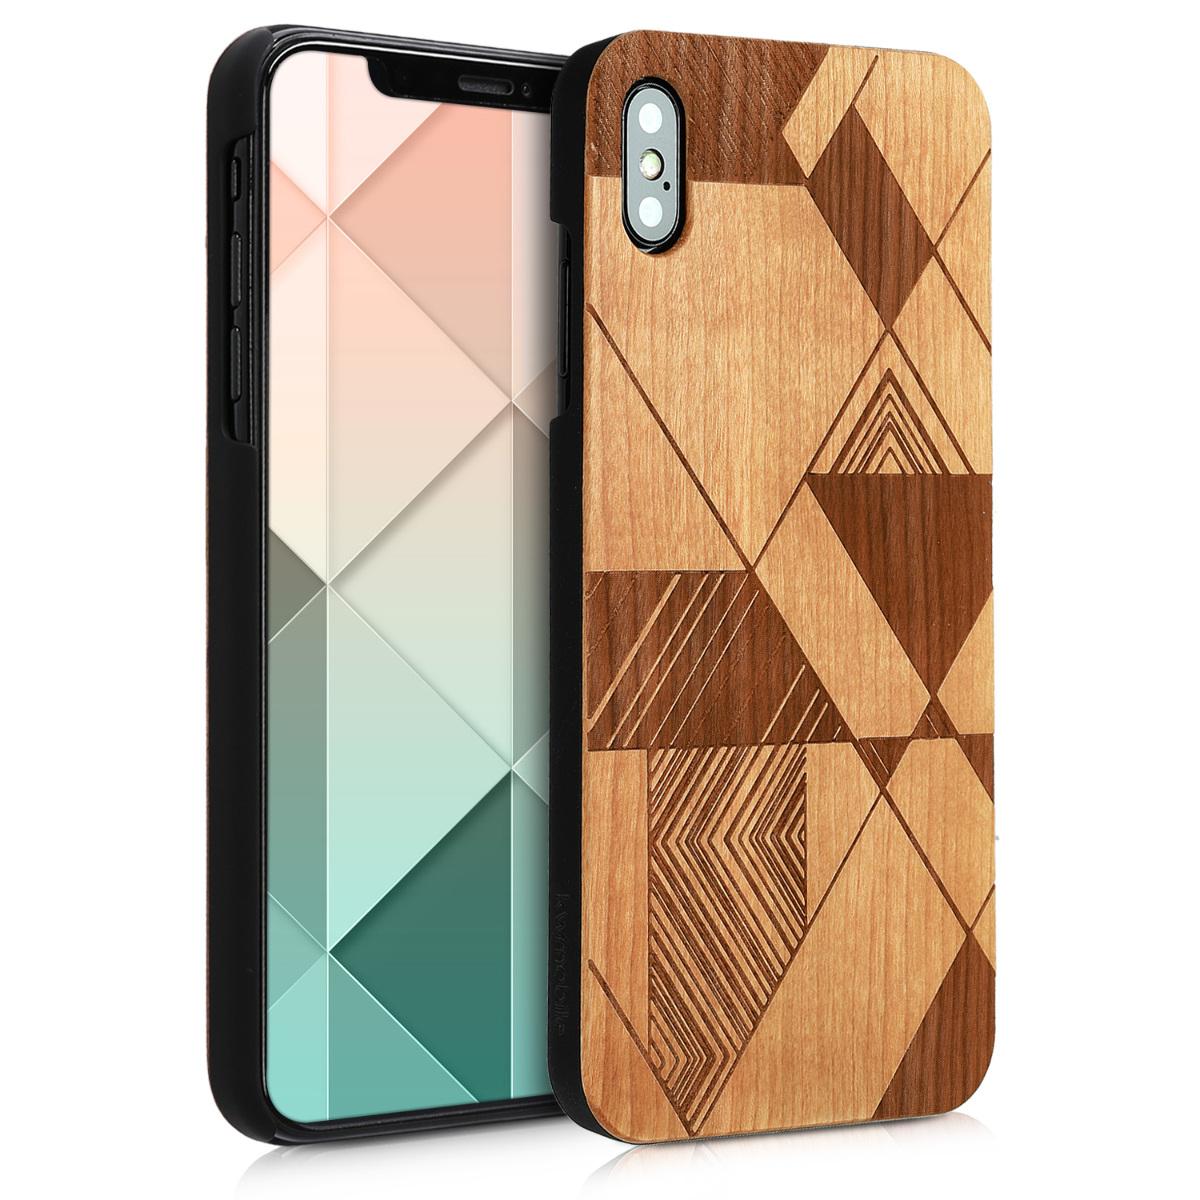 KW Ξύλινη Θήκη iPhone XS Max - Brown (46481.03)